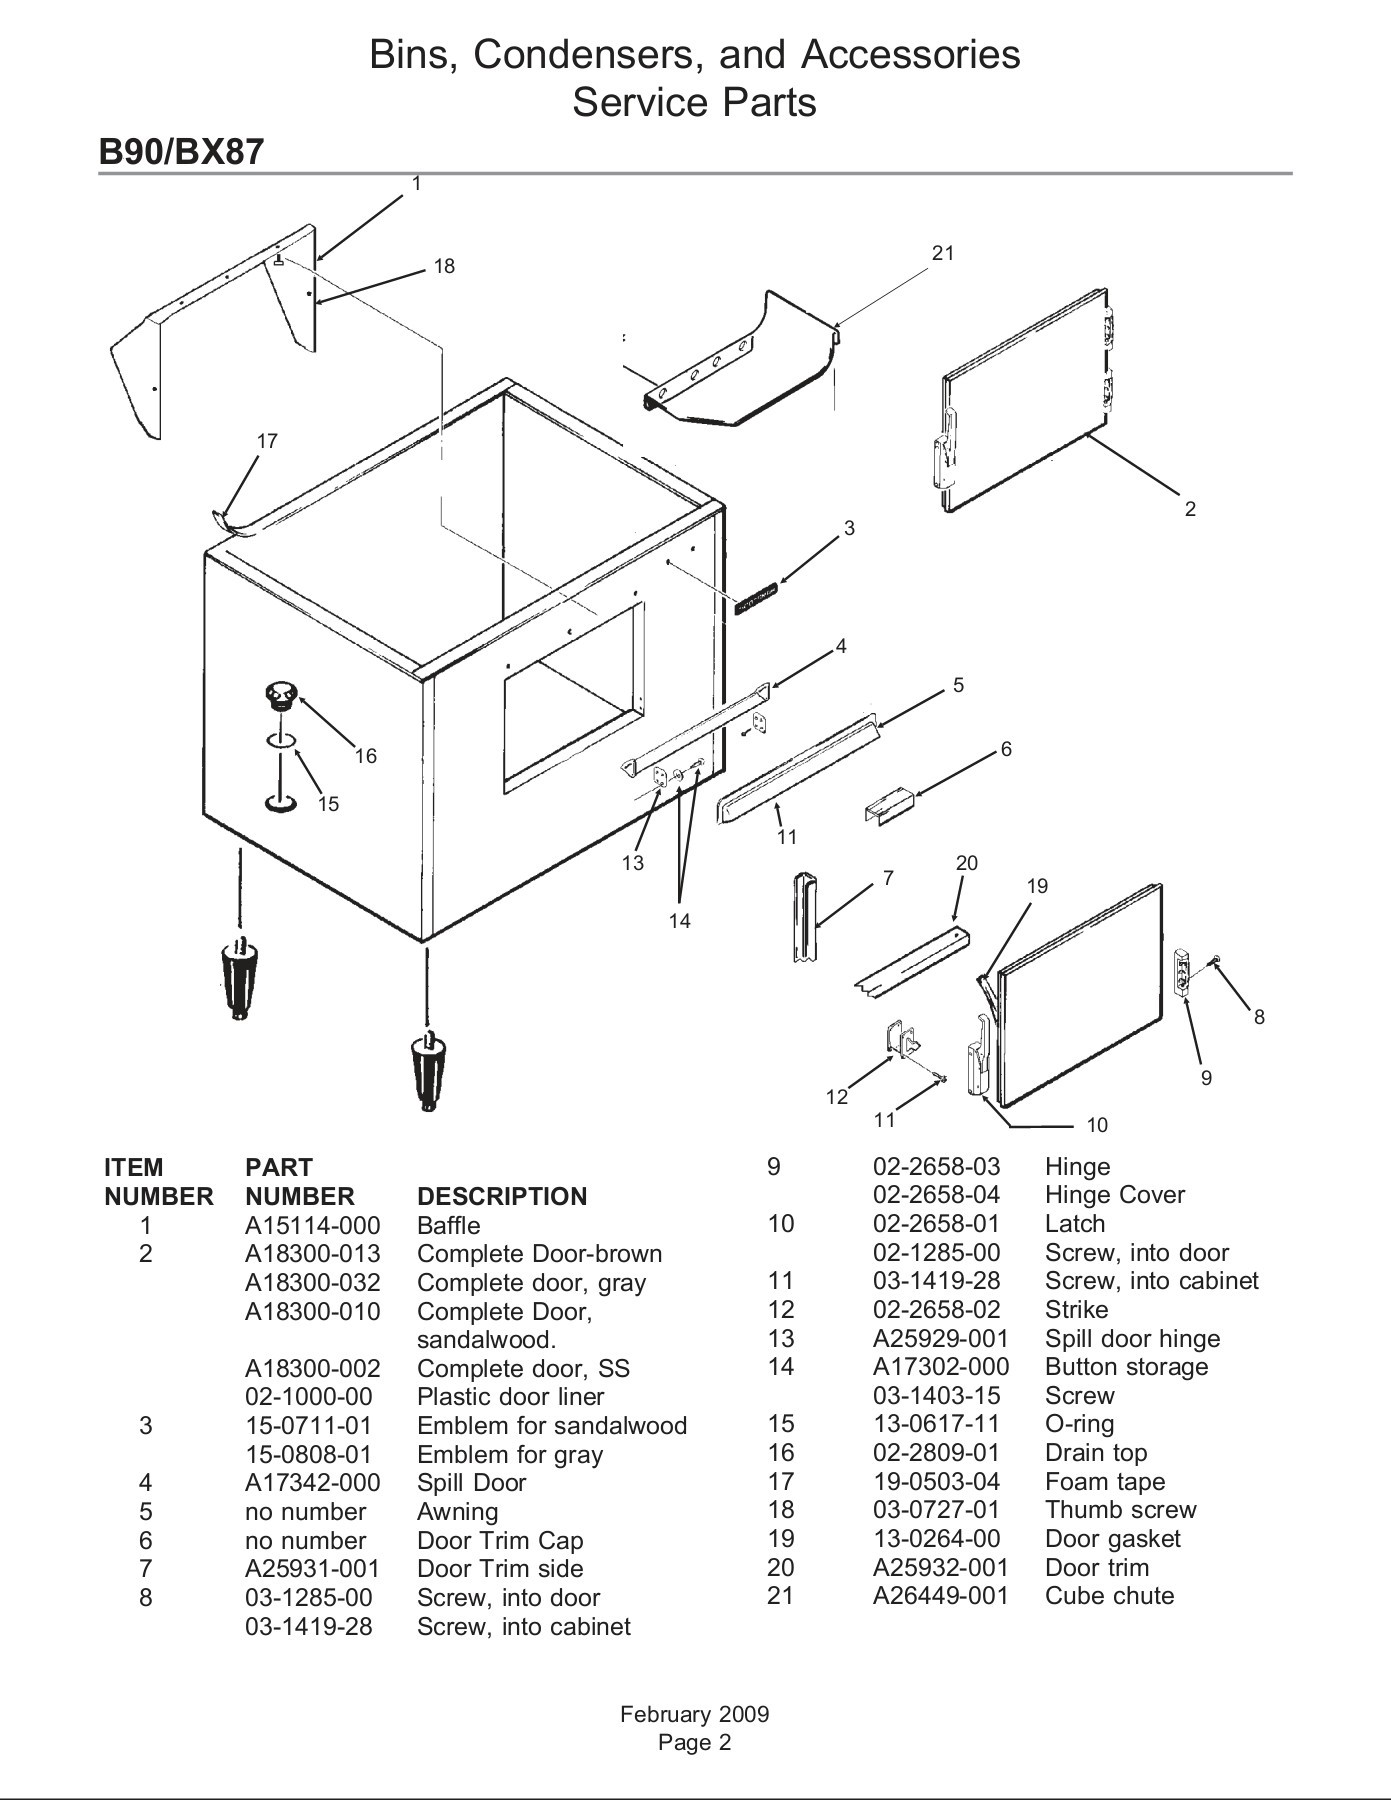 Scotsman 02-3769-01 Drain Assembly Cooktop Parts